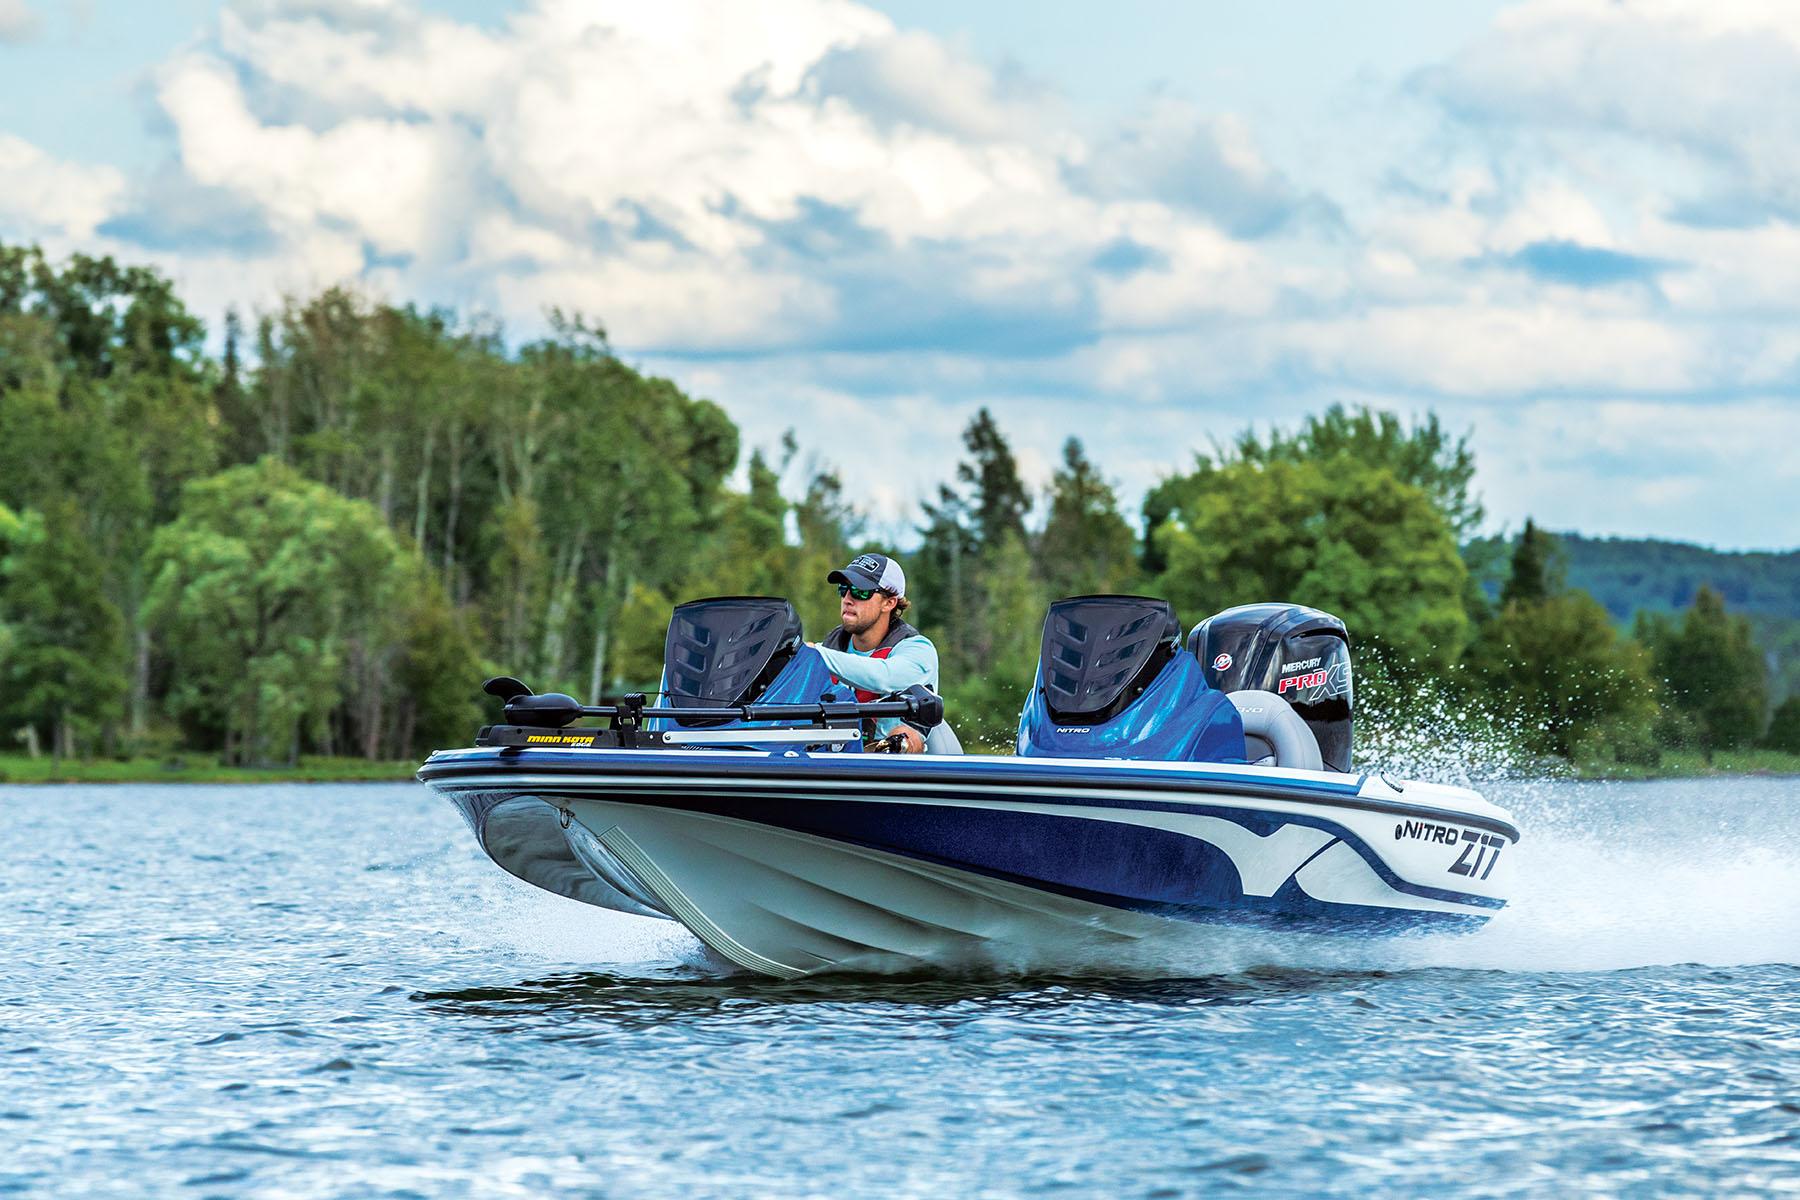 2018 NITRO® Z17 Bass Boat